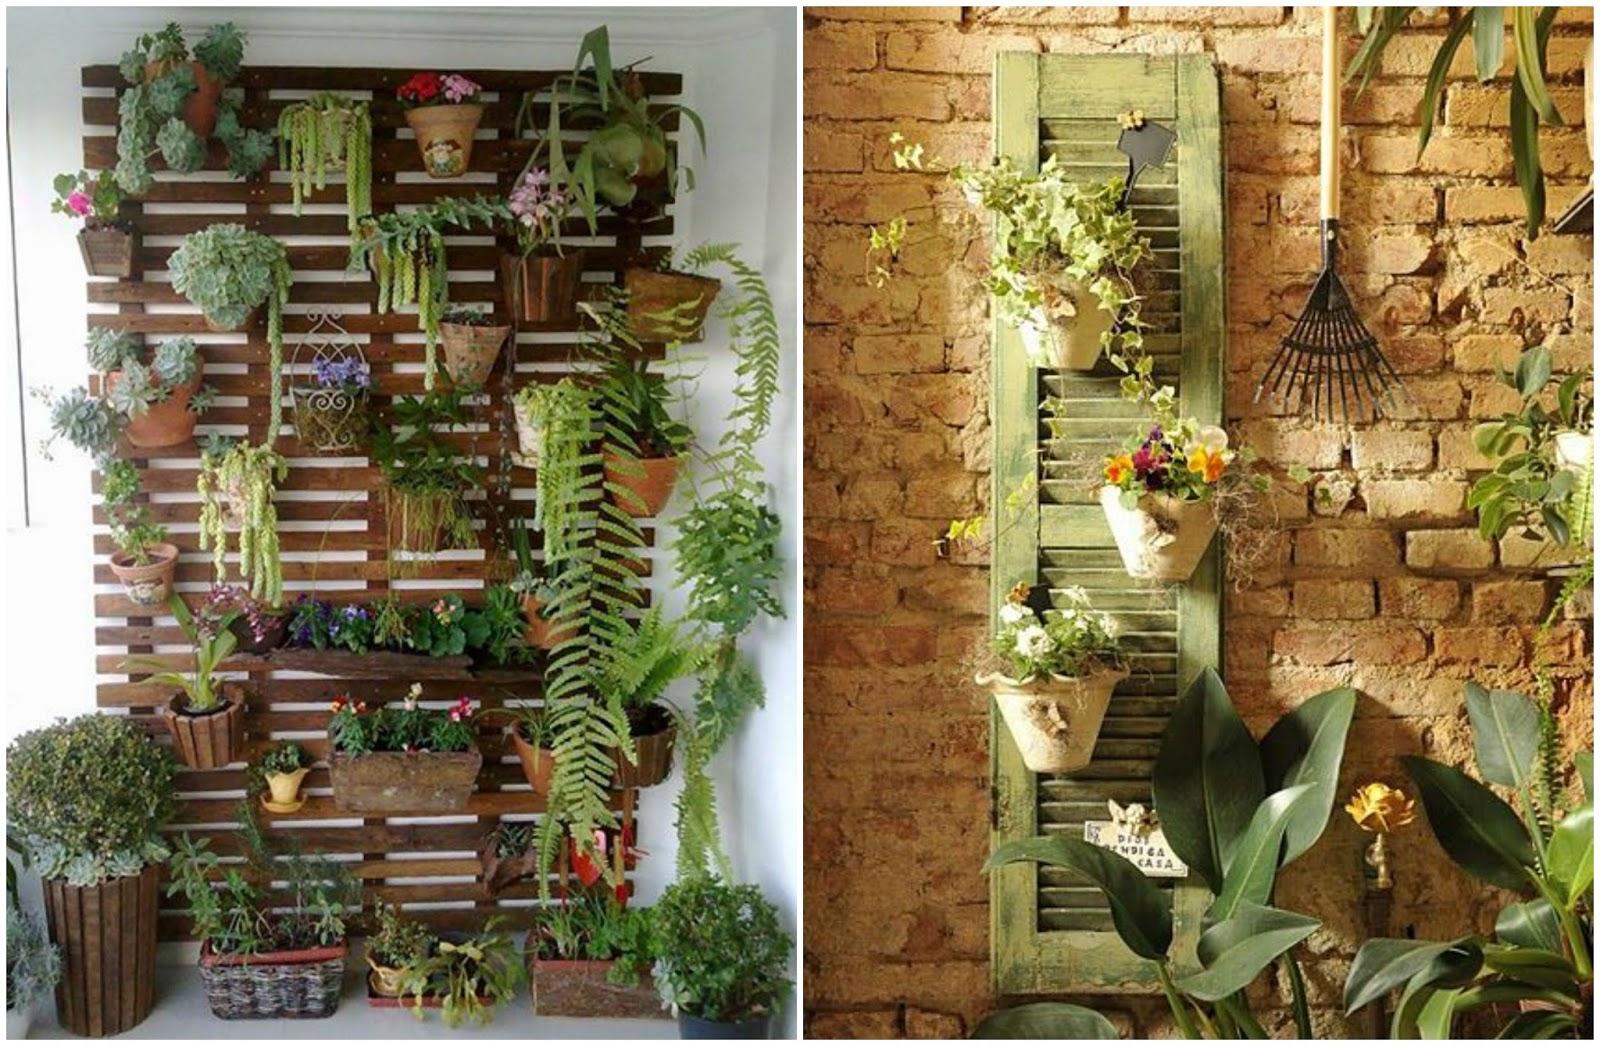 Decoração: Jardim vertical com pallets Distância Certa #6C4523 1600x1046